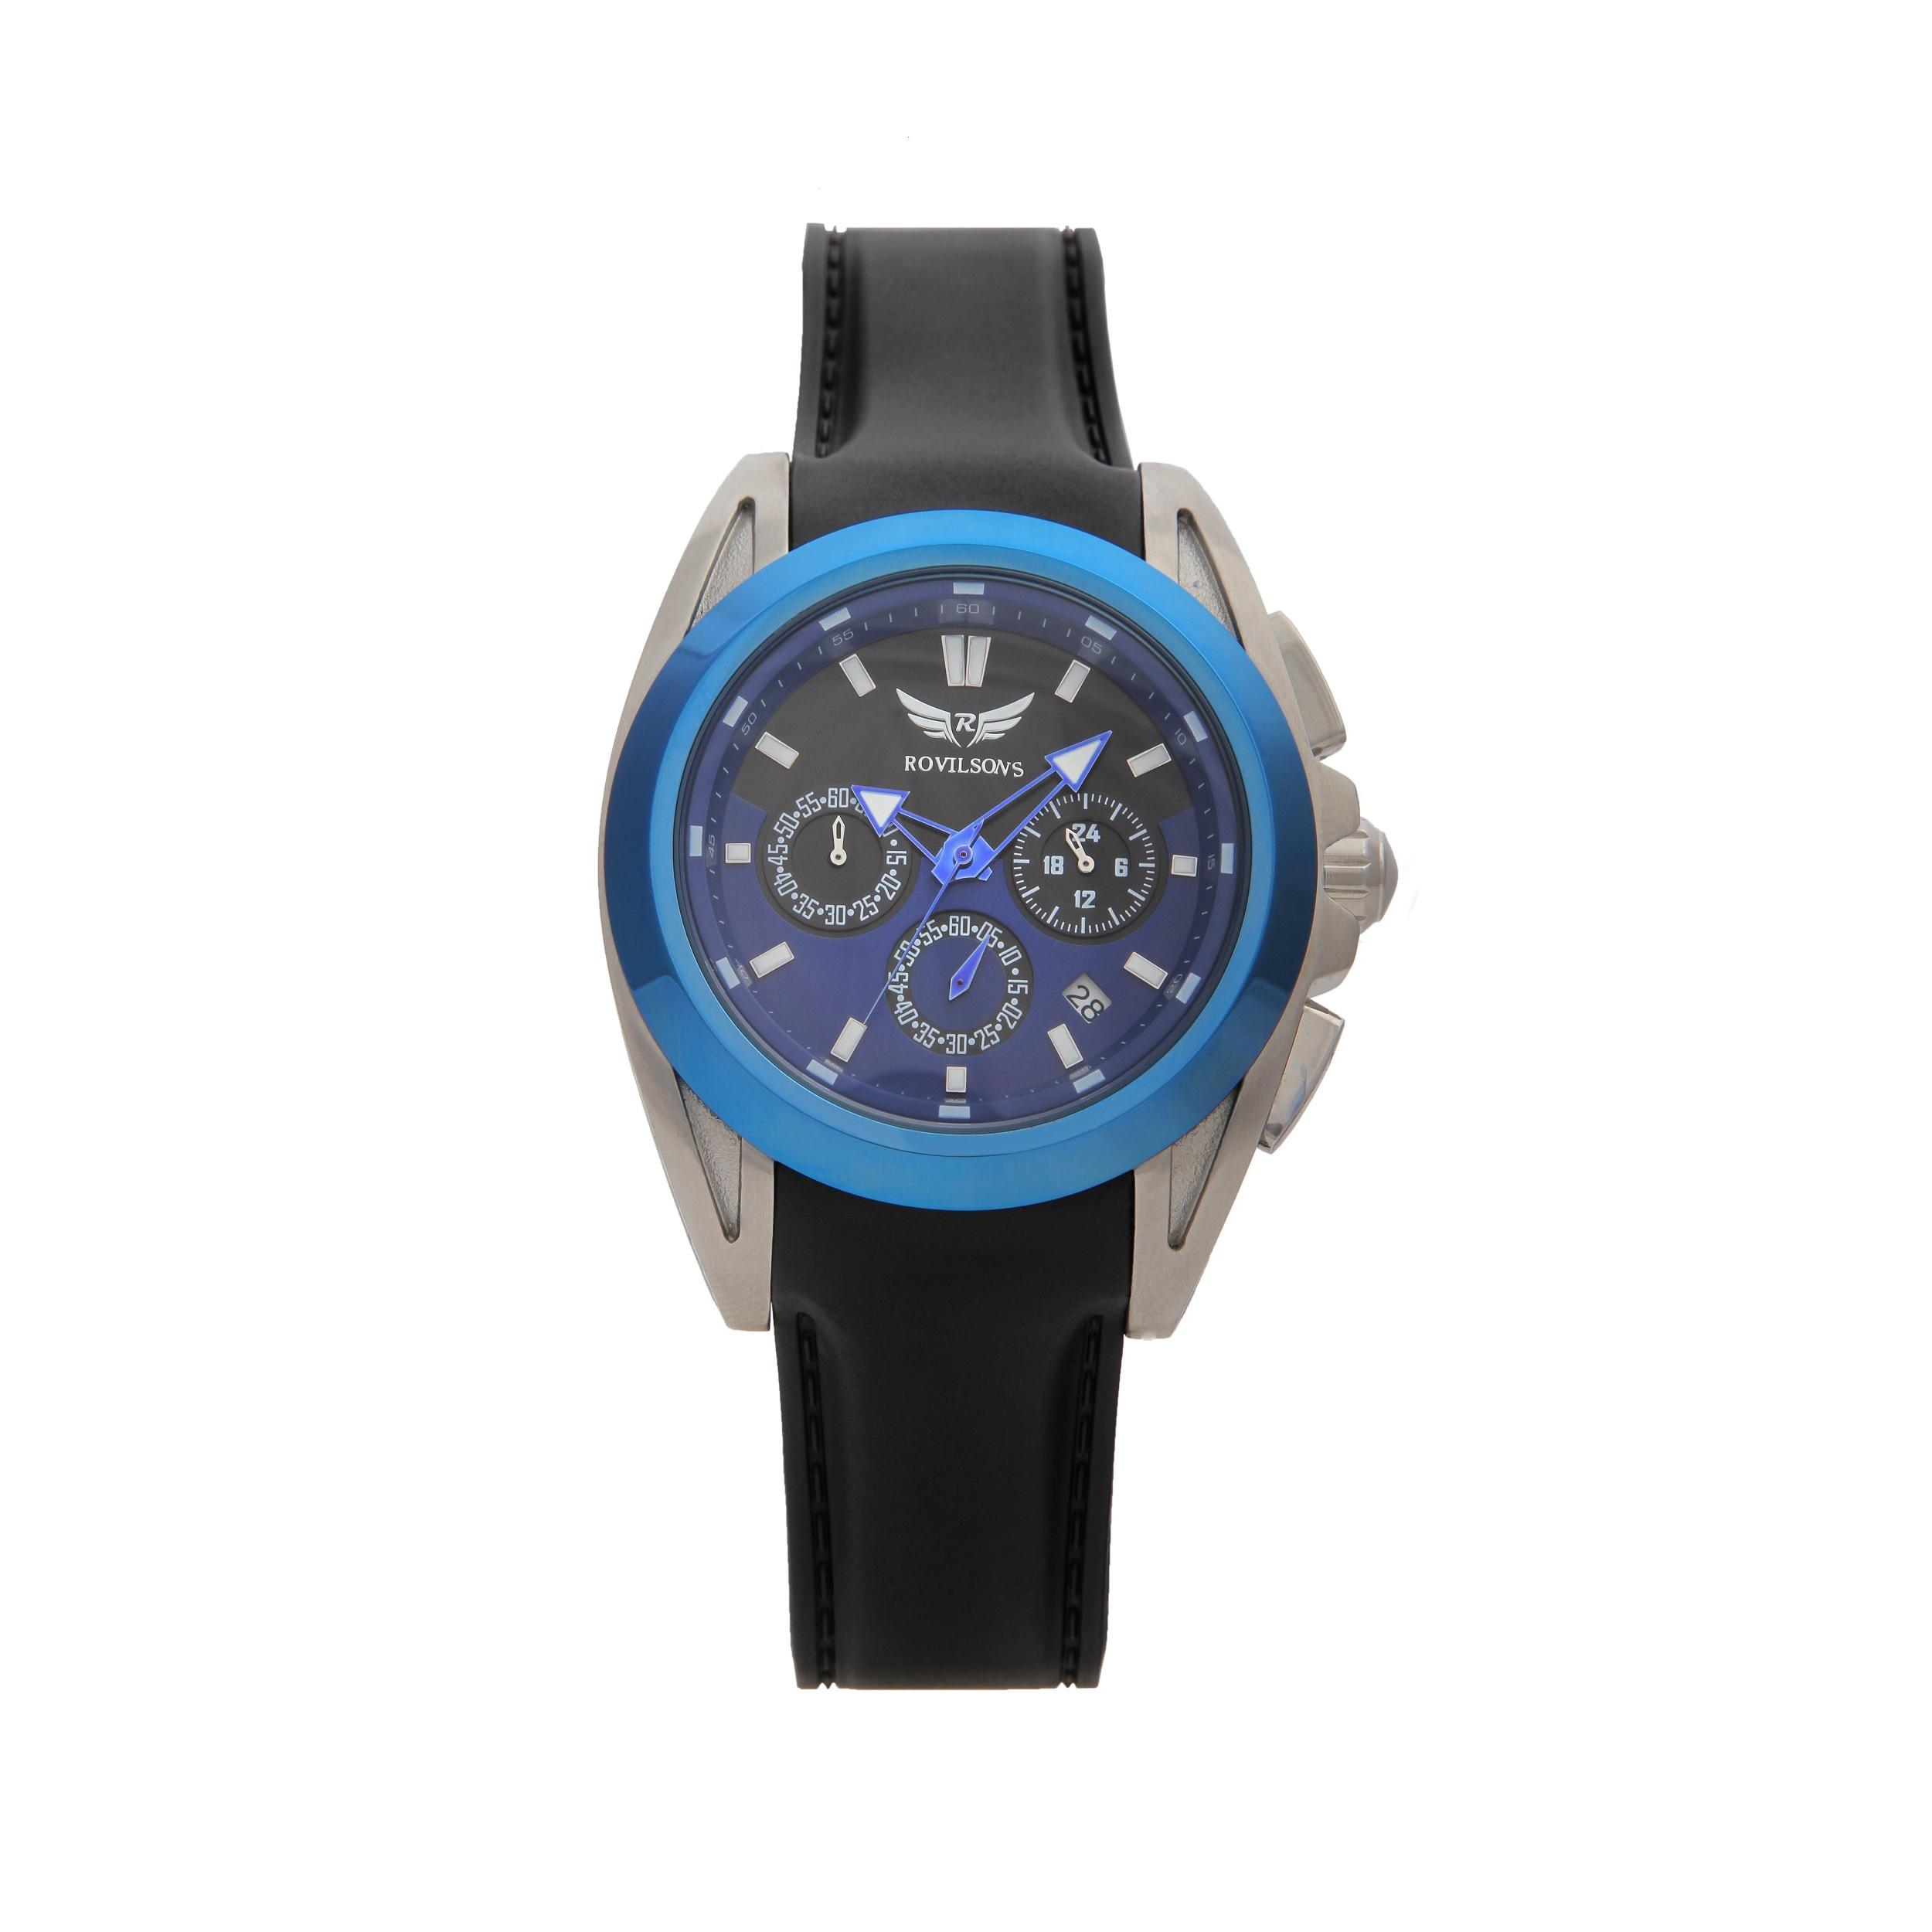 ساعت عقربه ای مردانه راویلسون کد RW-014-1